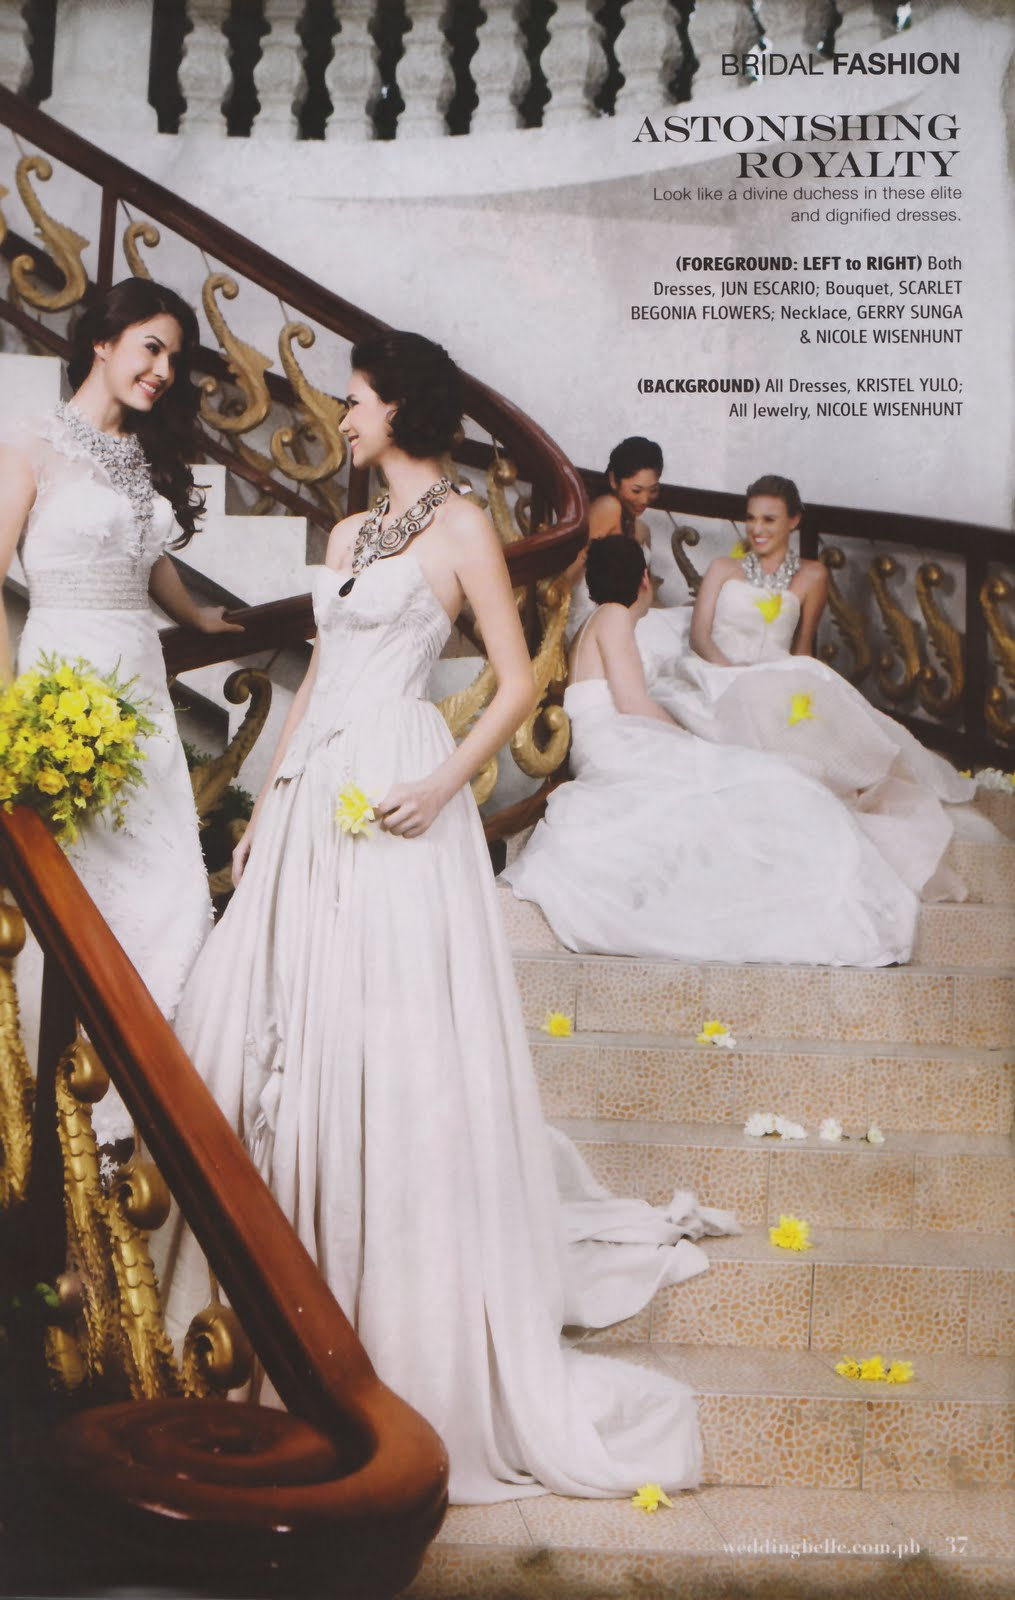 ⊰✿• .¸¸.⊰ Galeria de Priscilla Meirelles, Miss Earth 2004.⊰✿• .¸¸.⊰  - Página 3 Wedding%2BBelle%2B(Oct%2B2009)%2B6